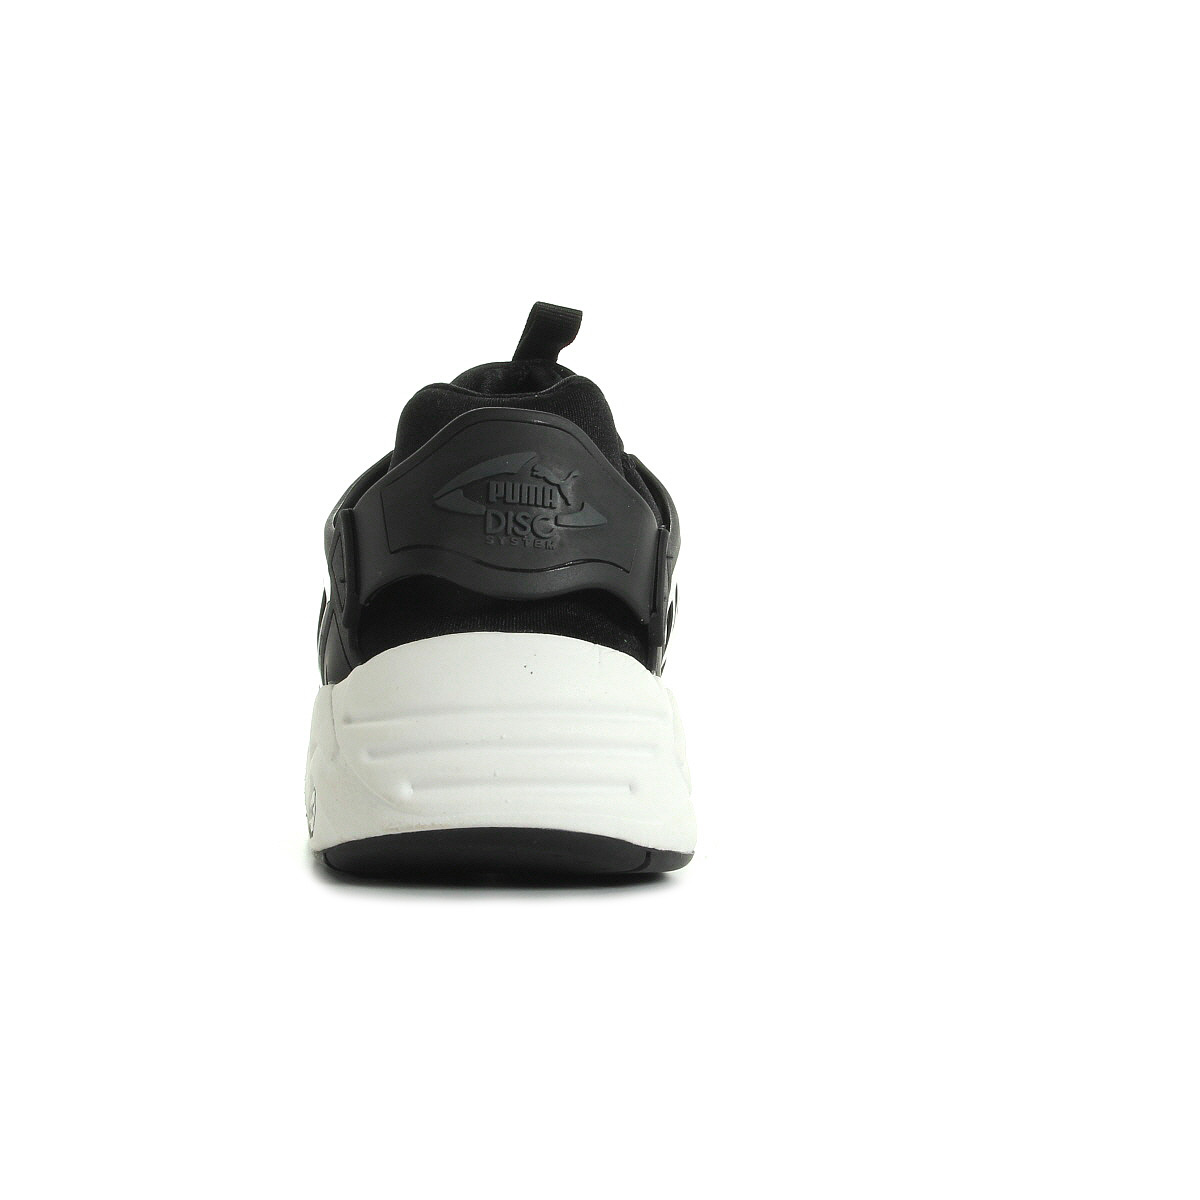 Puma Disc Blaze-updated core spec 35951604, Baskets mode homme